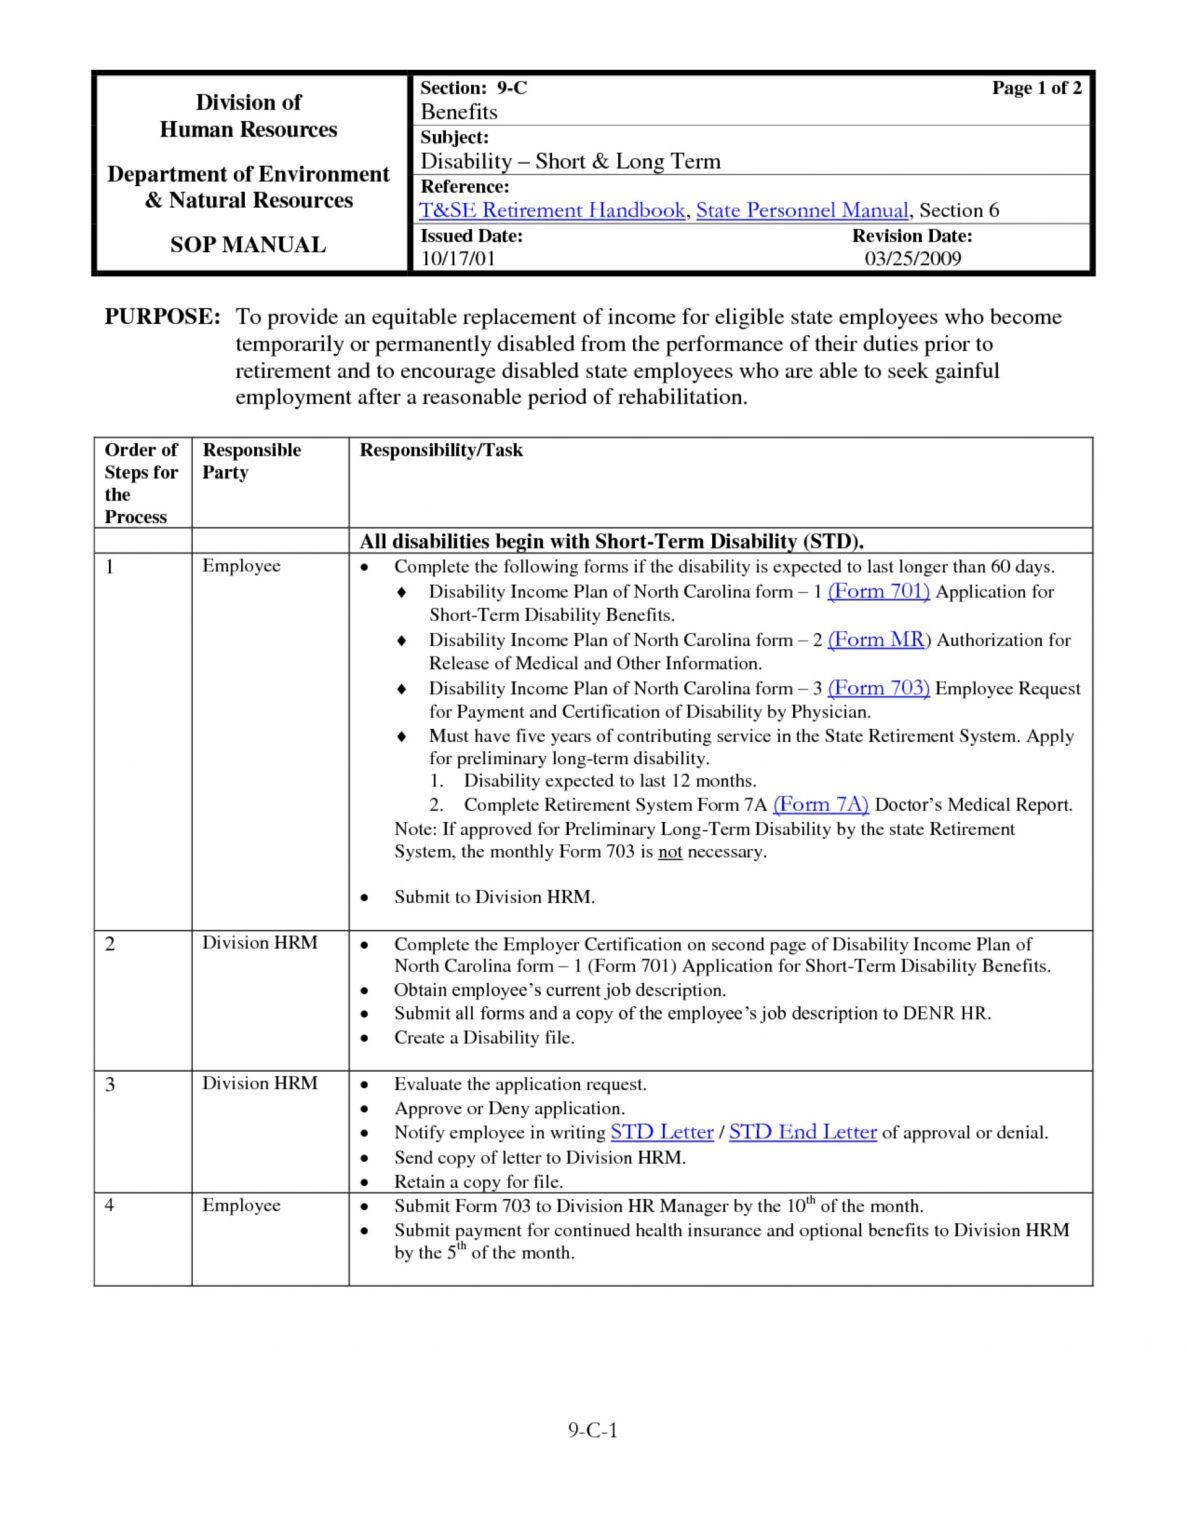 025 Policy And Procedure Template Manual Word Sample Great Regarding Procedure Man Standard Operating Procedure Template Standard Operating Procedure Word Free